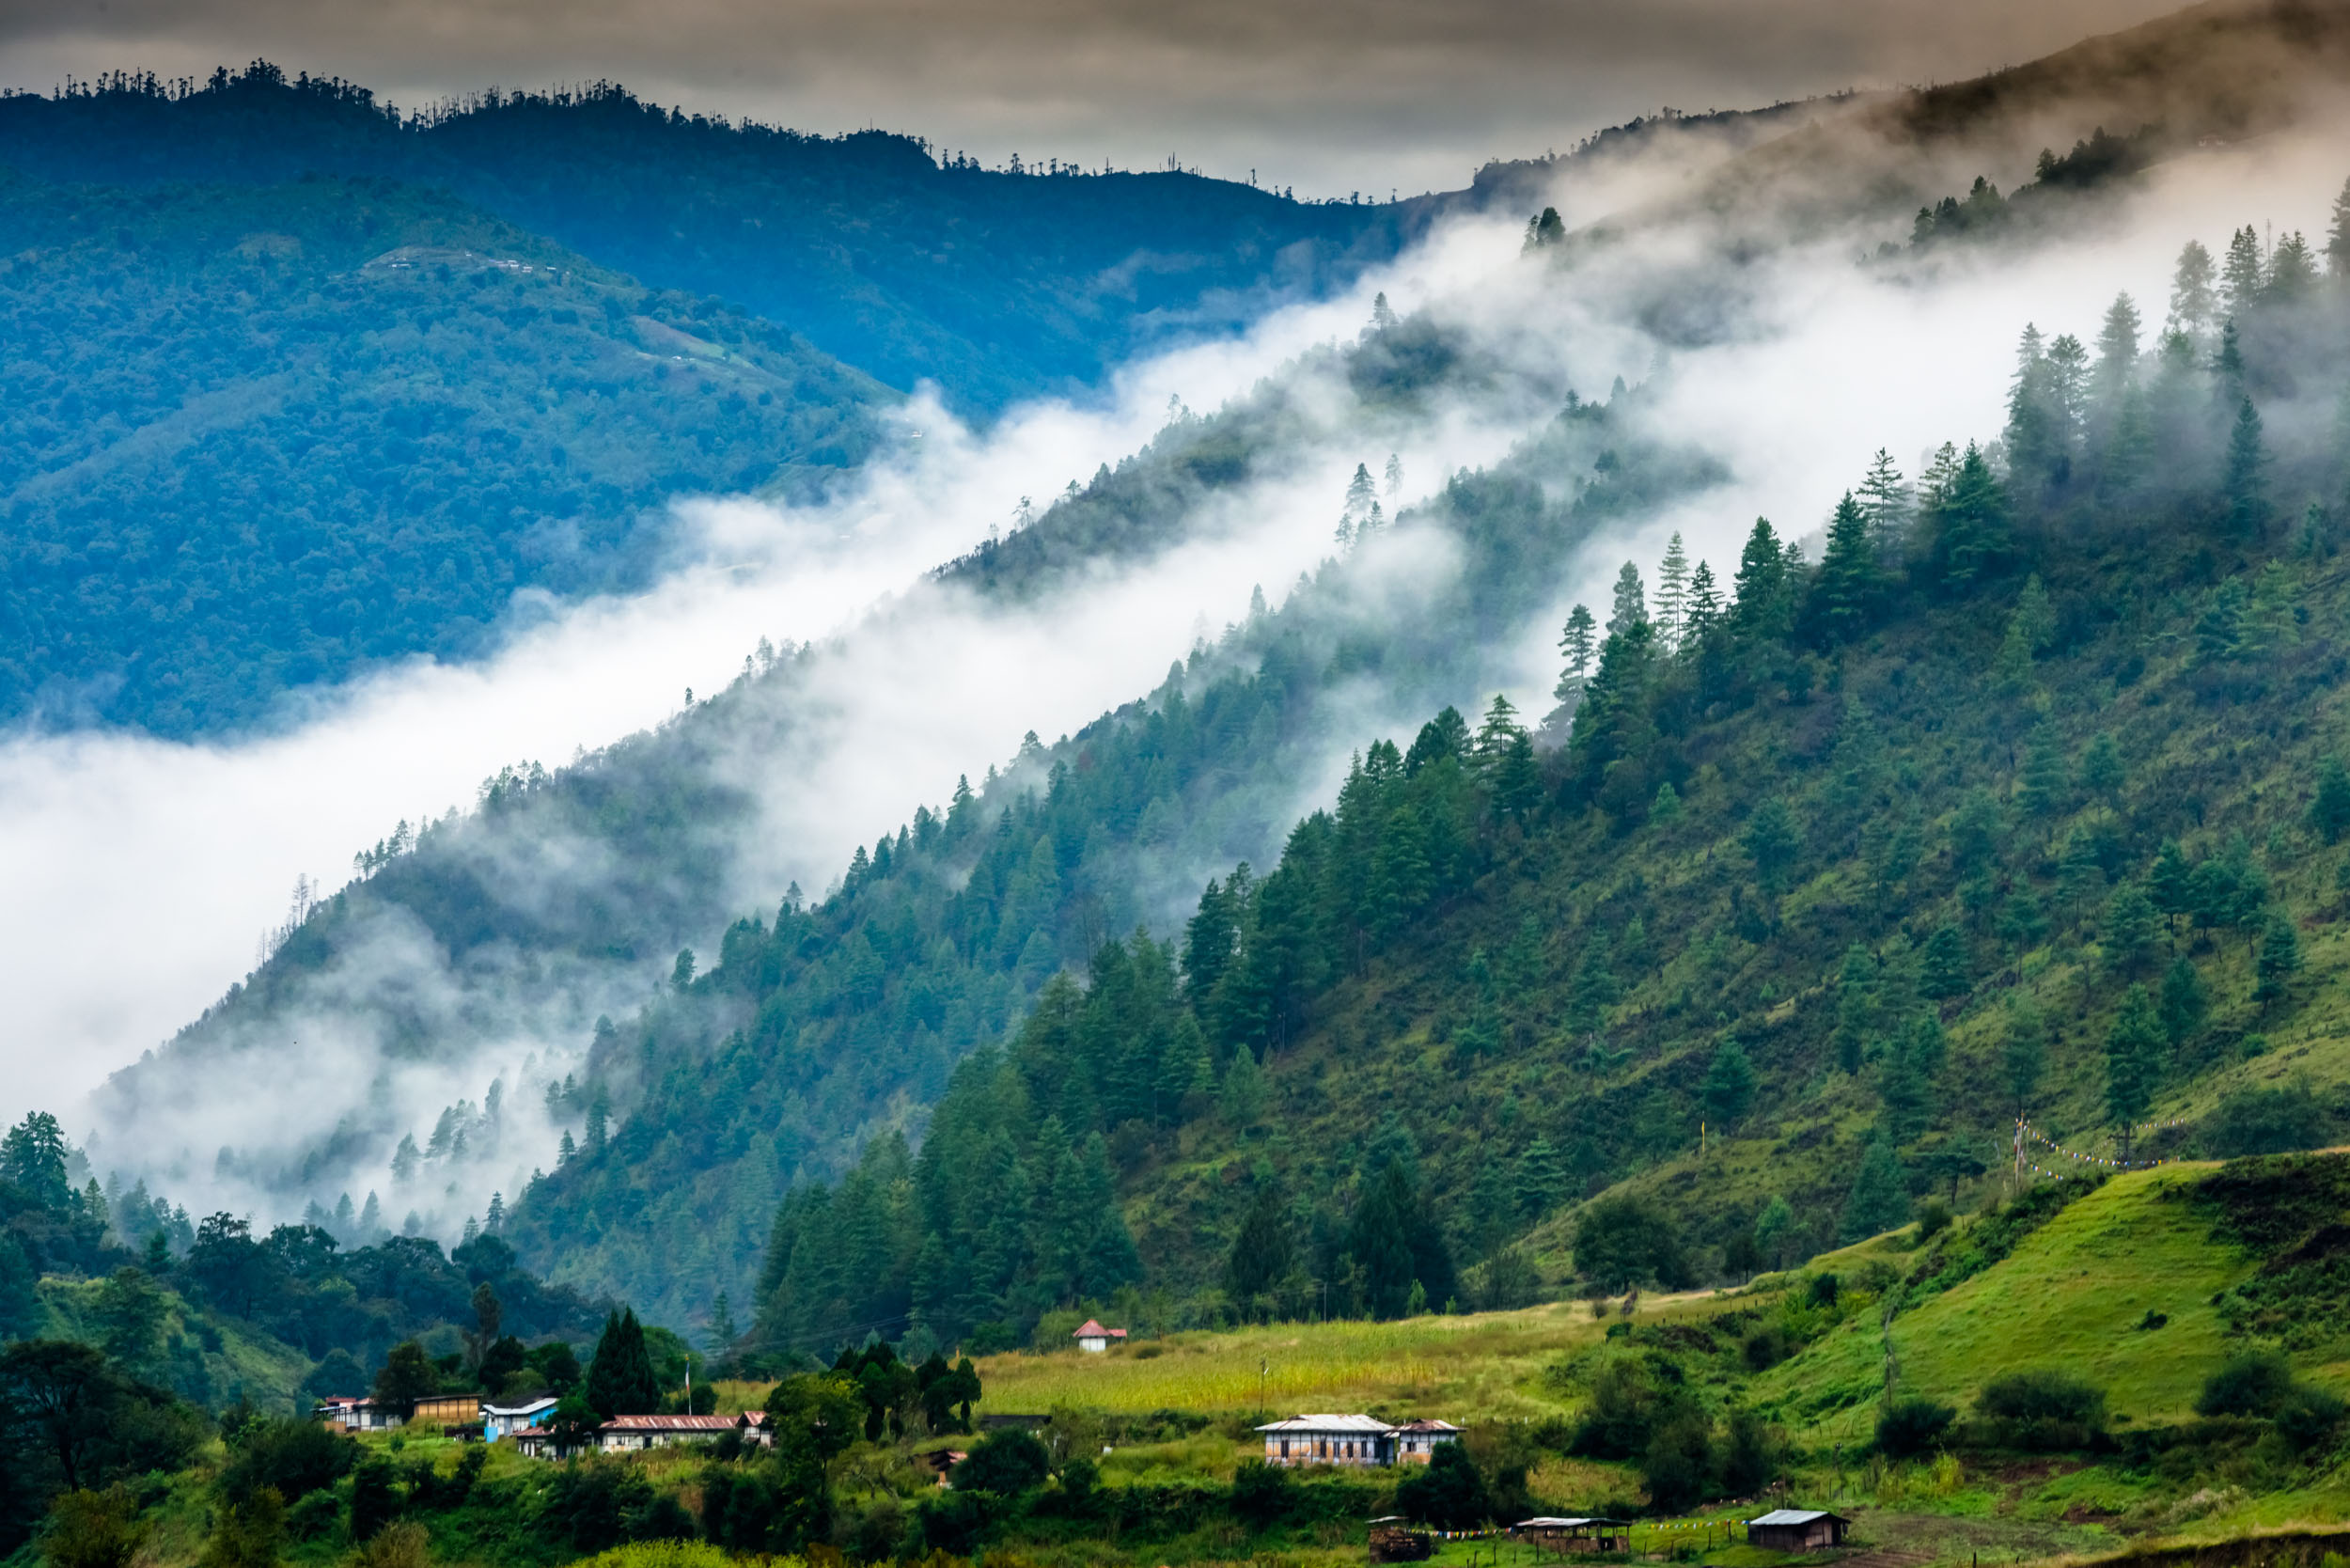 Mist Layers above village